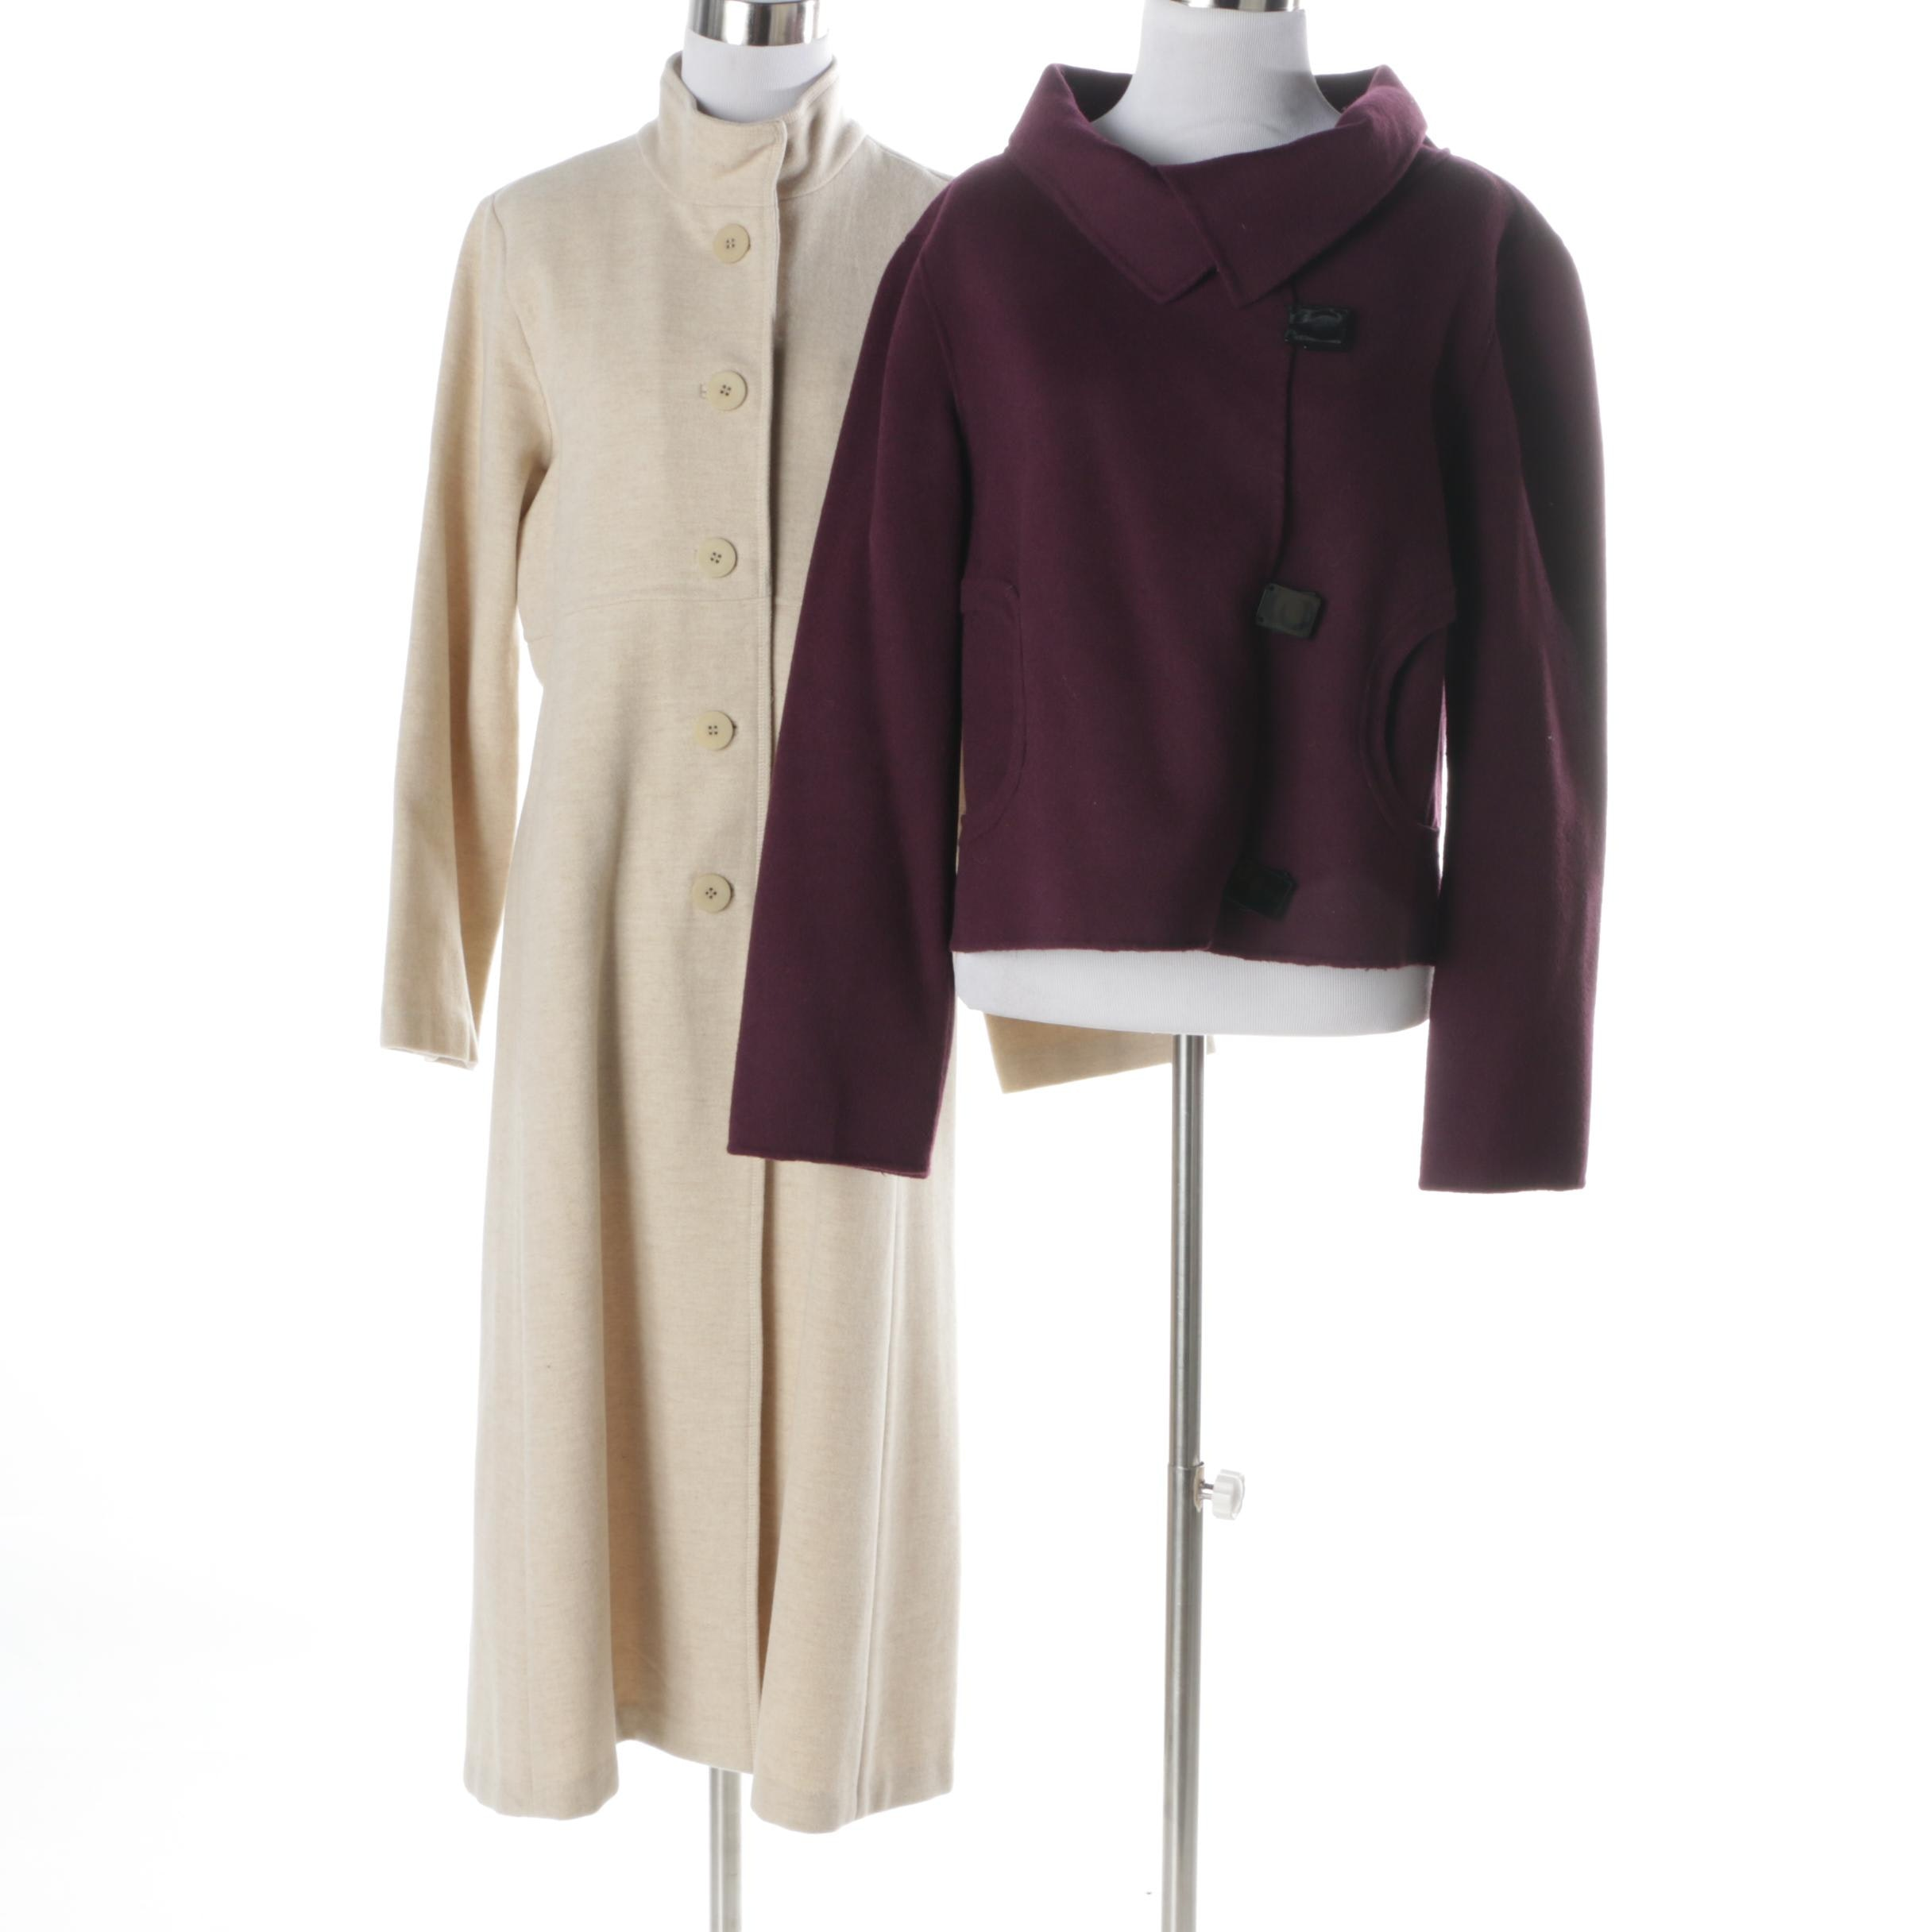 Women's Eileen Fisher Petite Coat and Carole Little Jacket